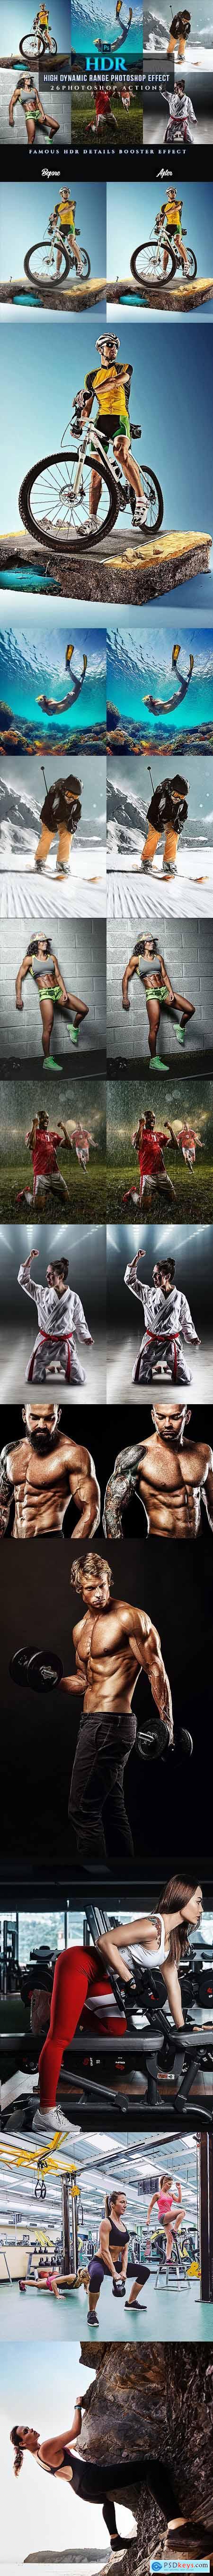 HDR Sport Magazine Photoshop 26 Effects 24381878